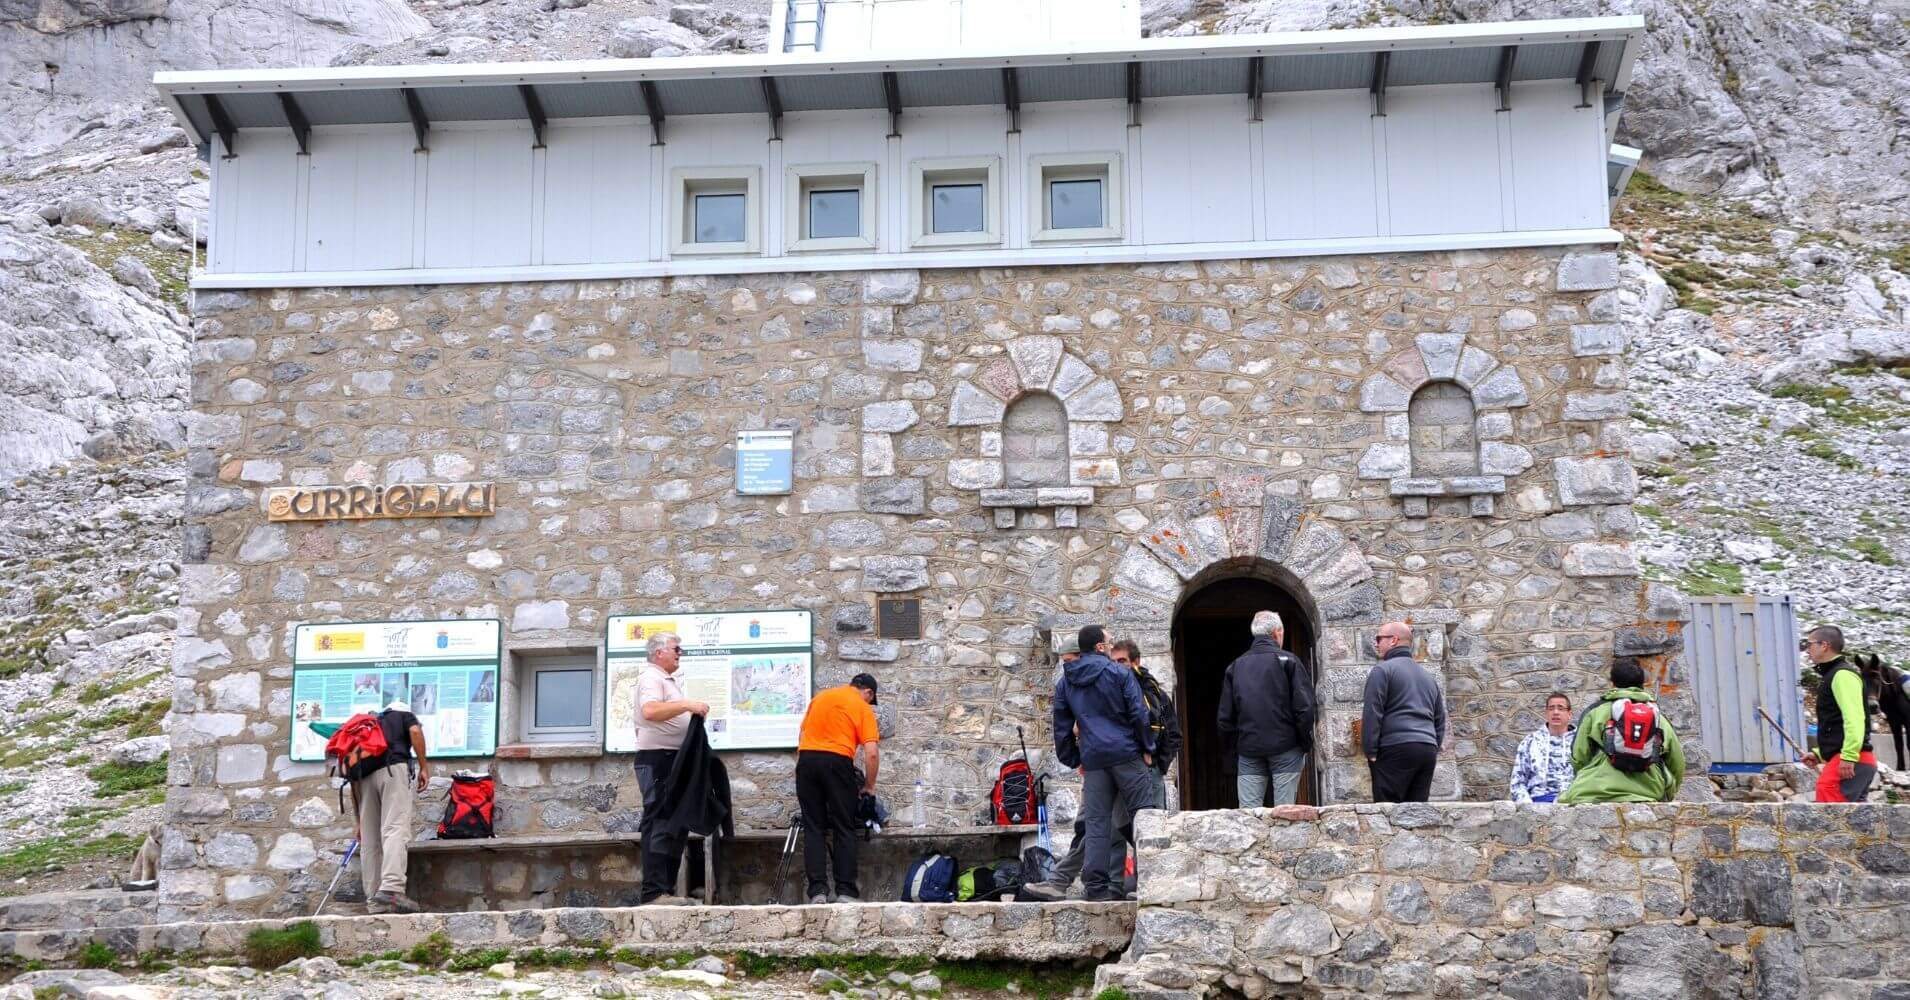 Refugio Urriellu o Delgado Úbeda. Travesía de Picos de Europa. Asturias.